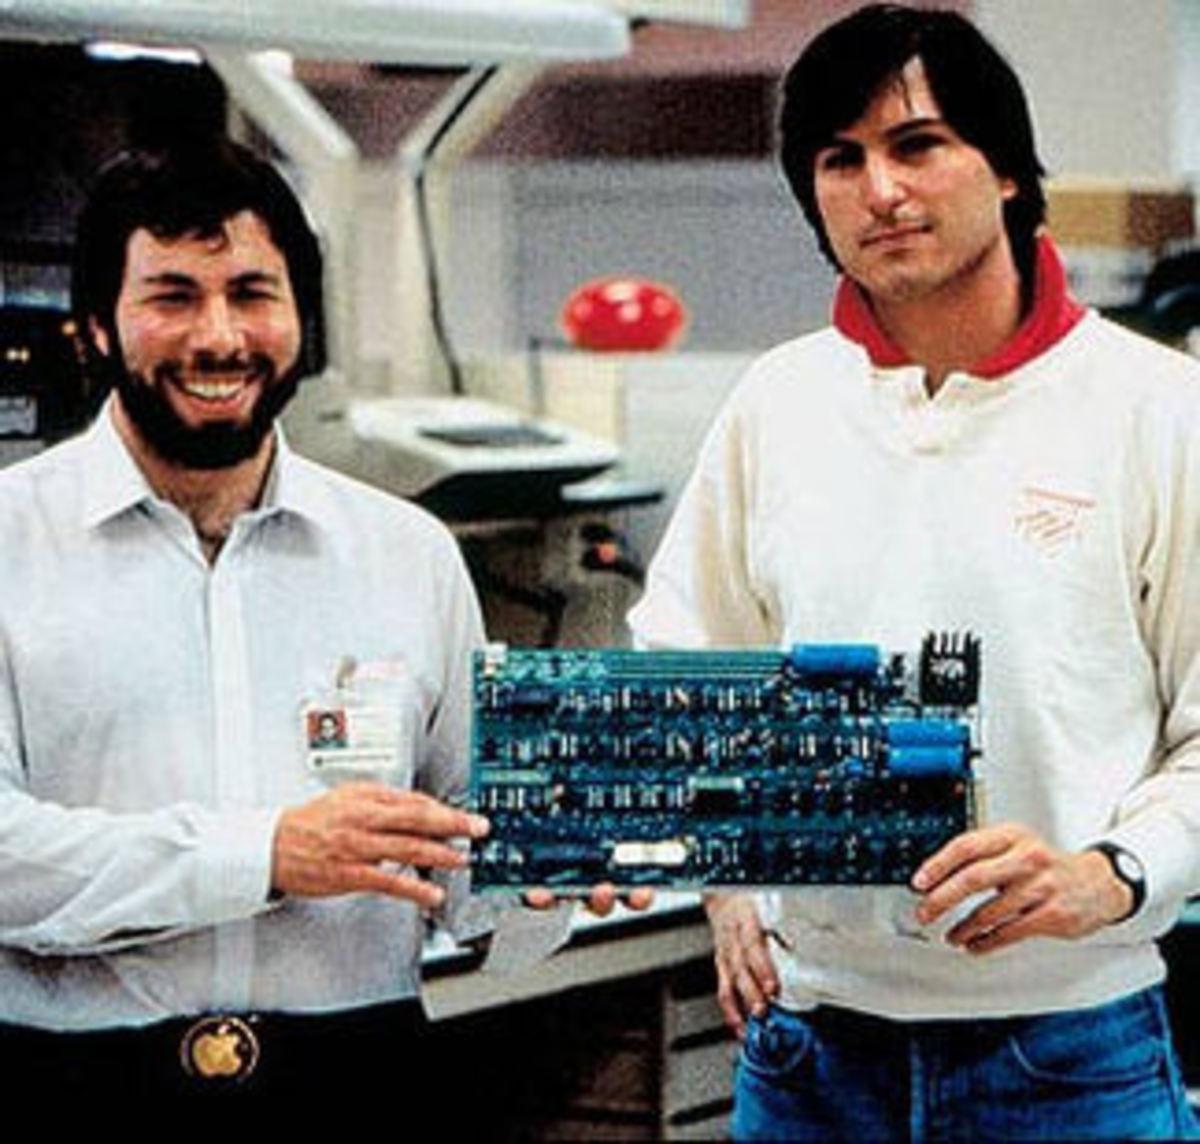 Wozniak and Jobs